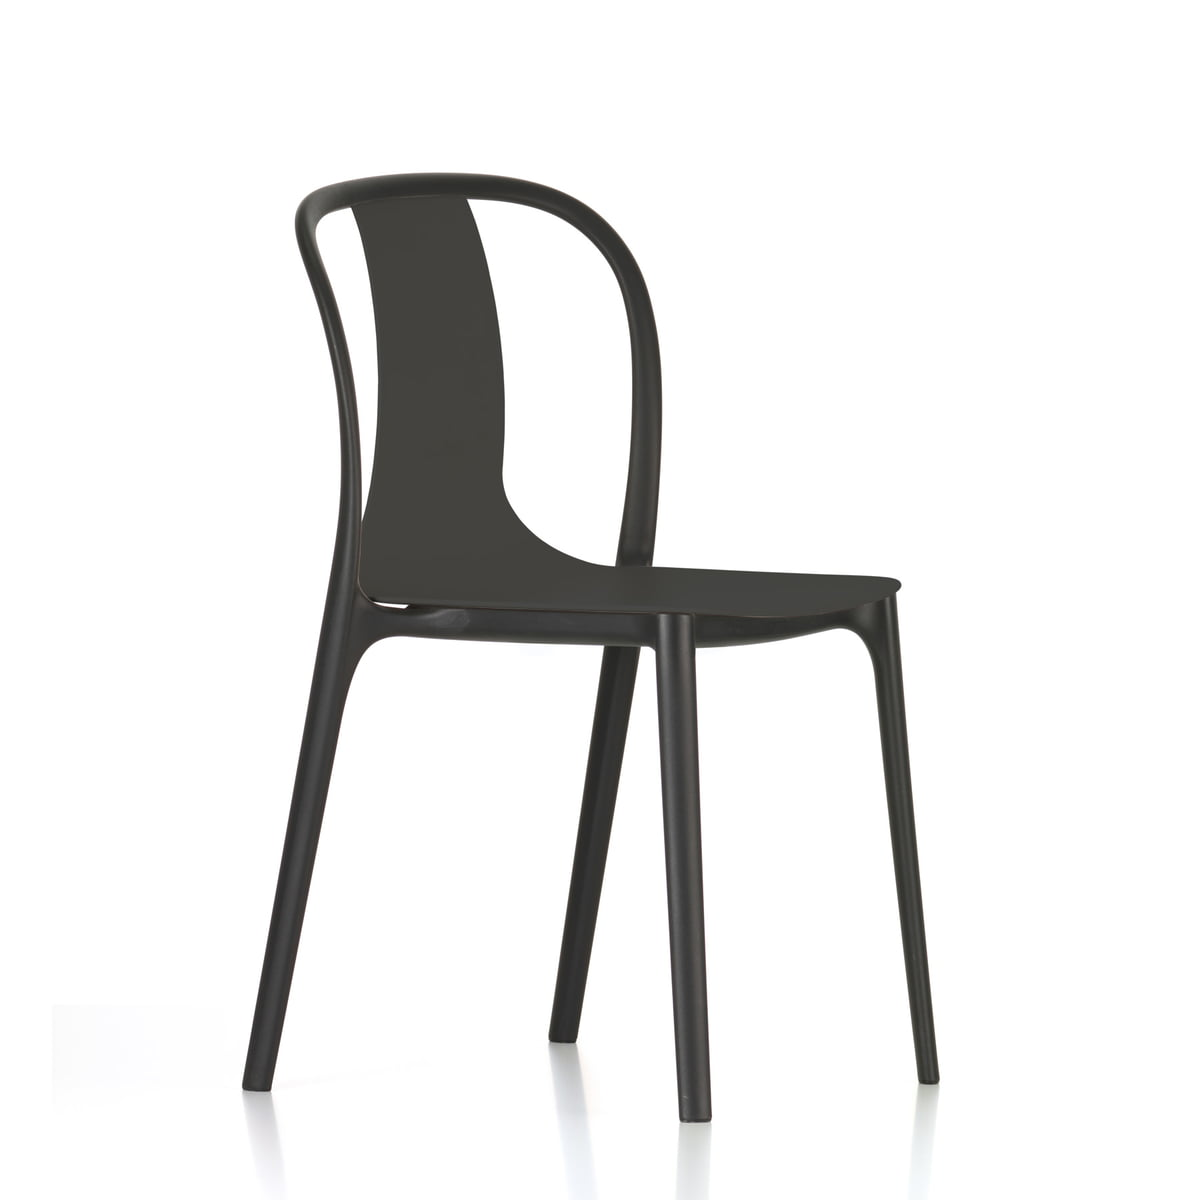 Belleville chair plastic by vitra in the shop - Designer stuhl vitra ...